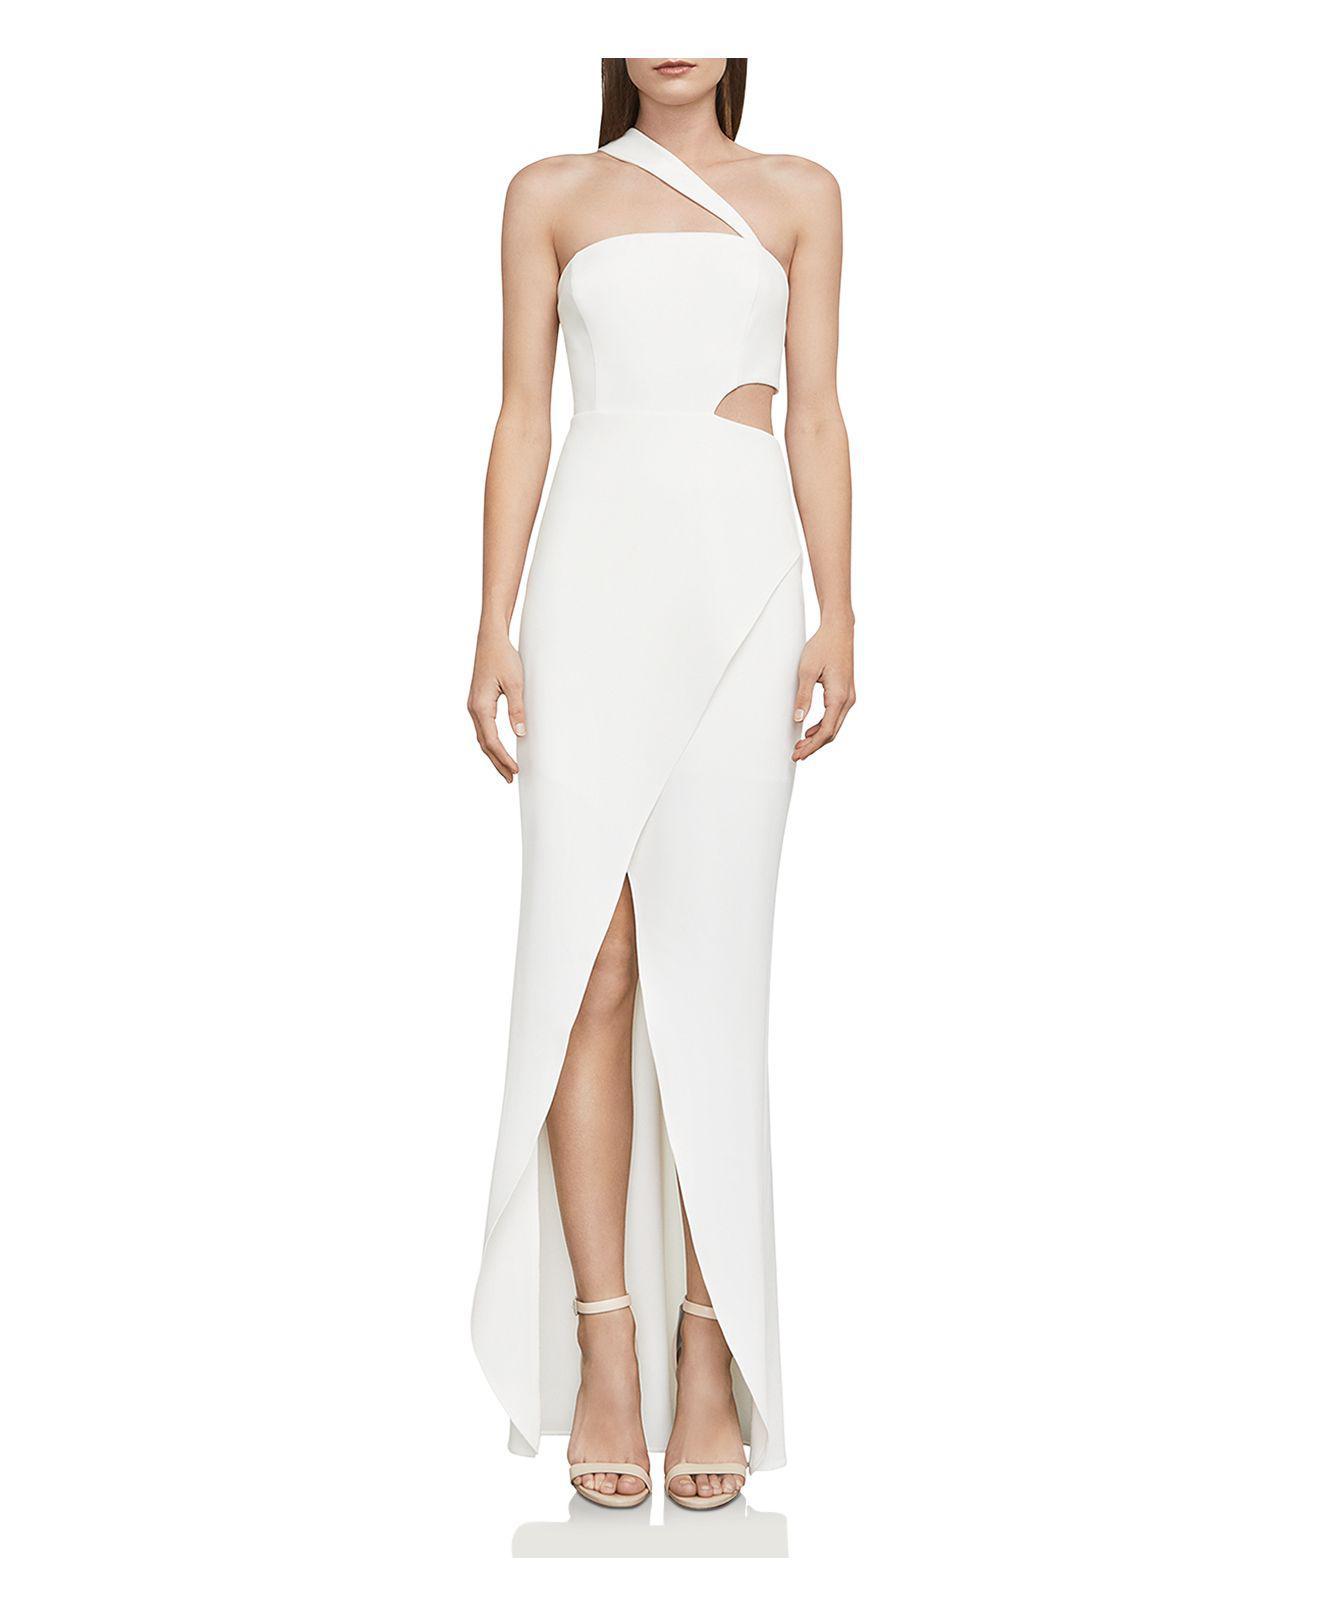 Lyst - Bcbgmaxazria One-shoulder Cutout Gown in White